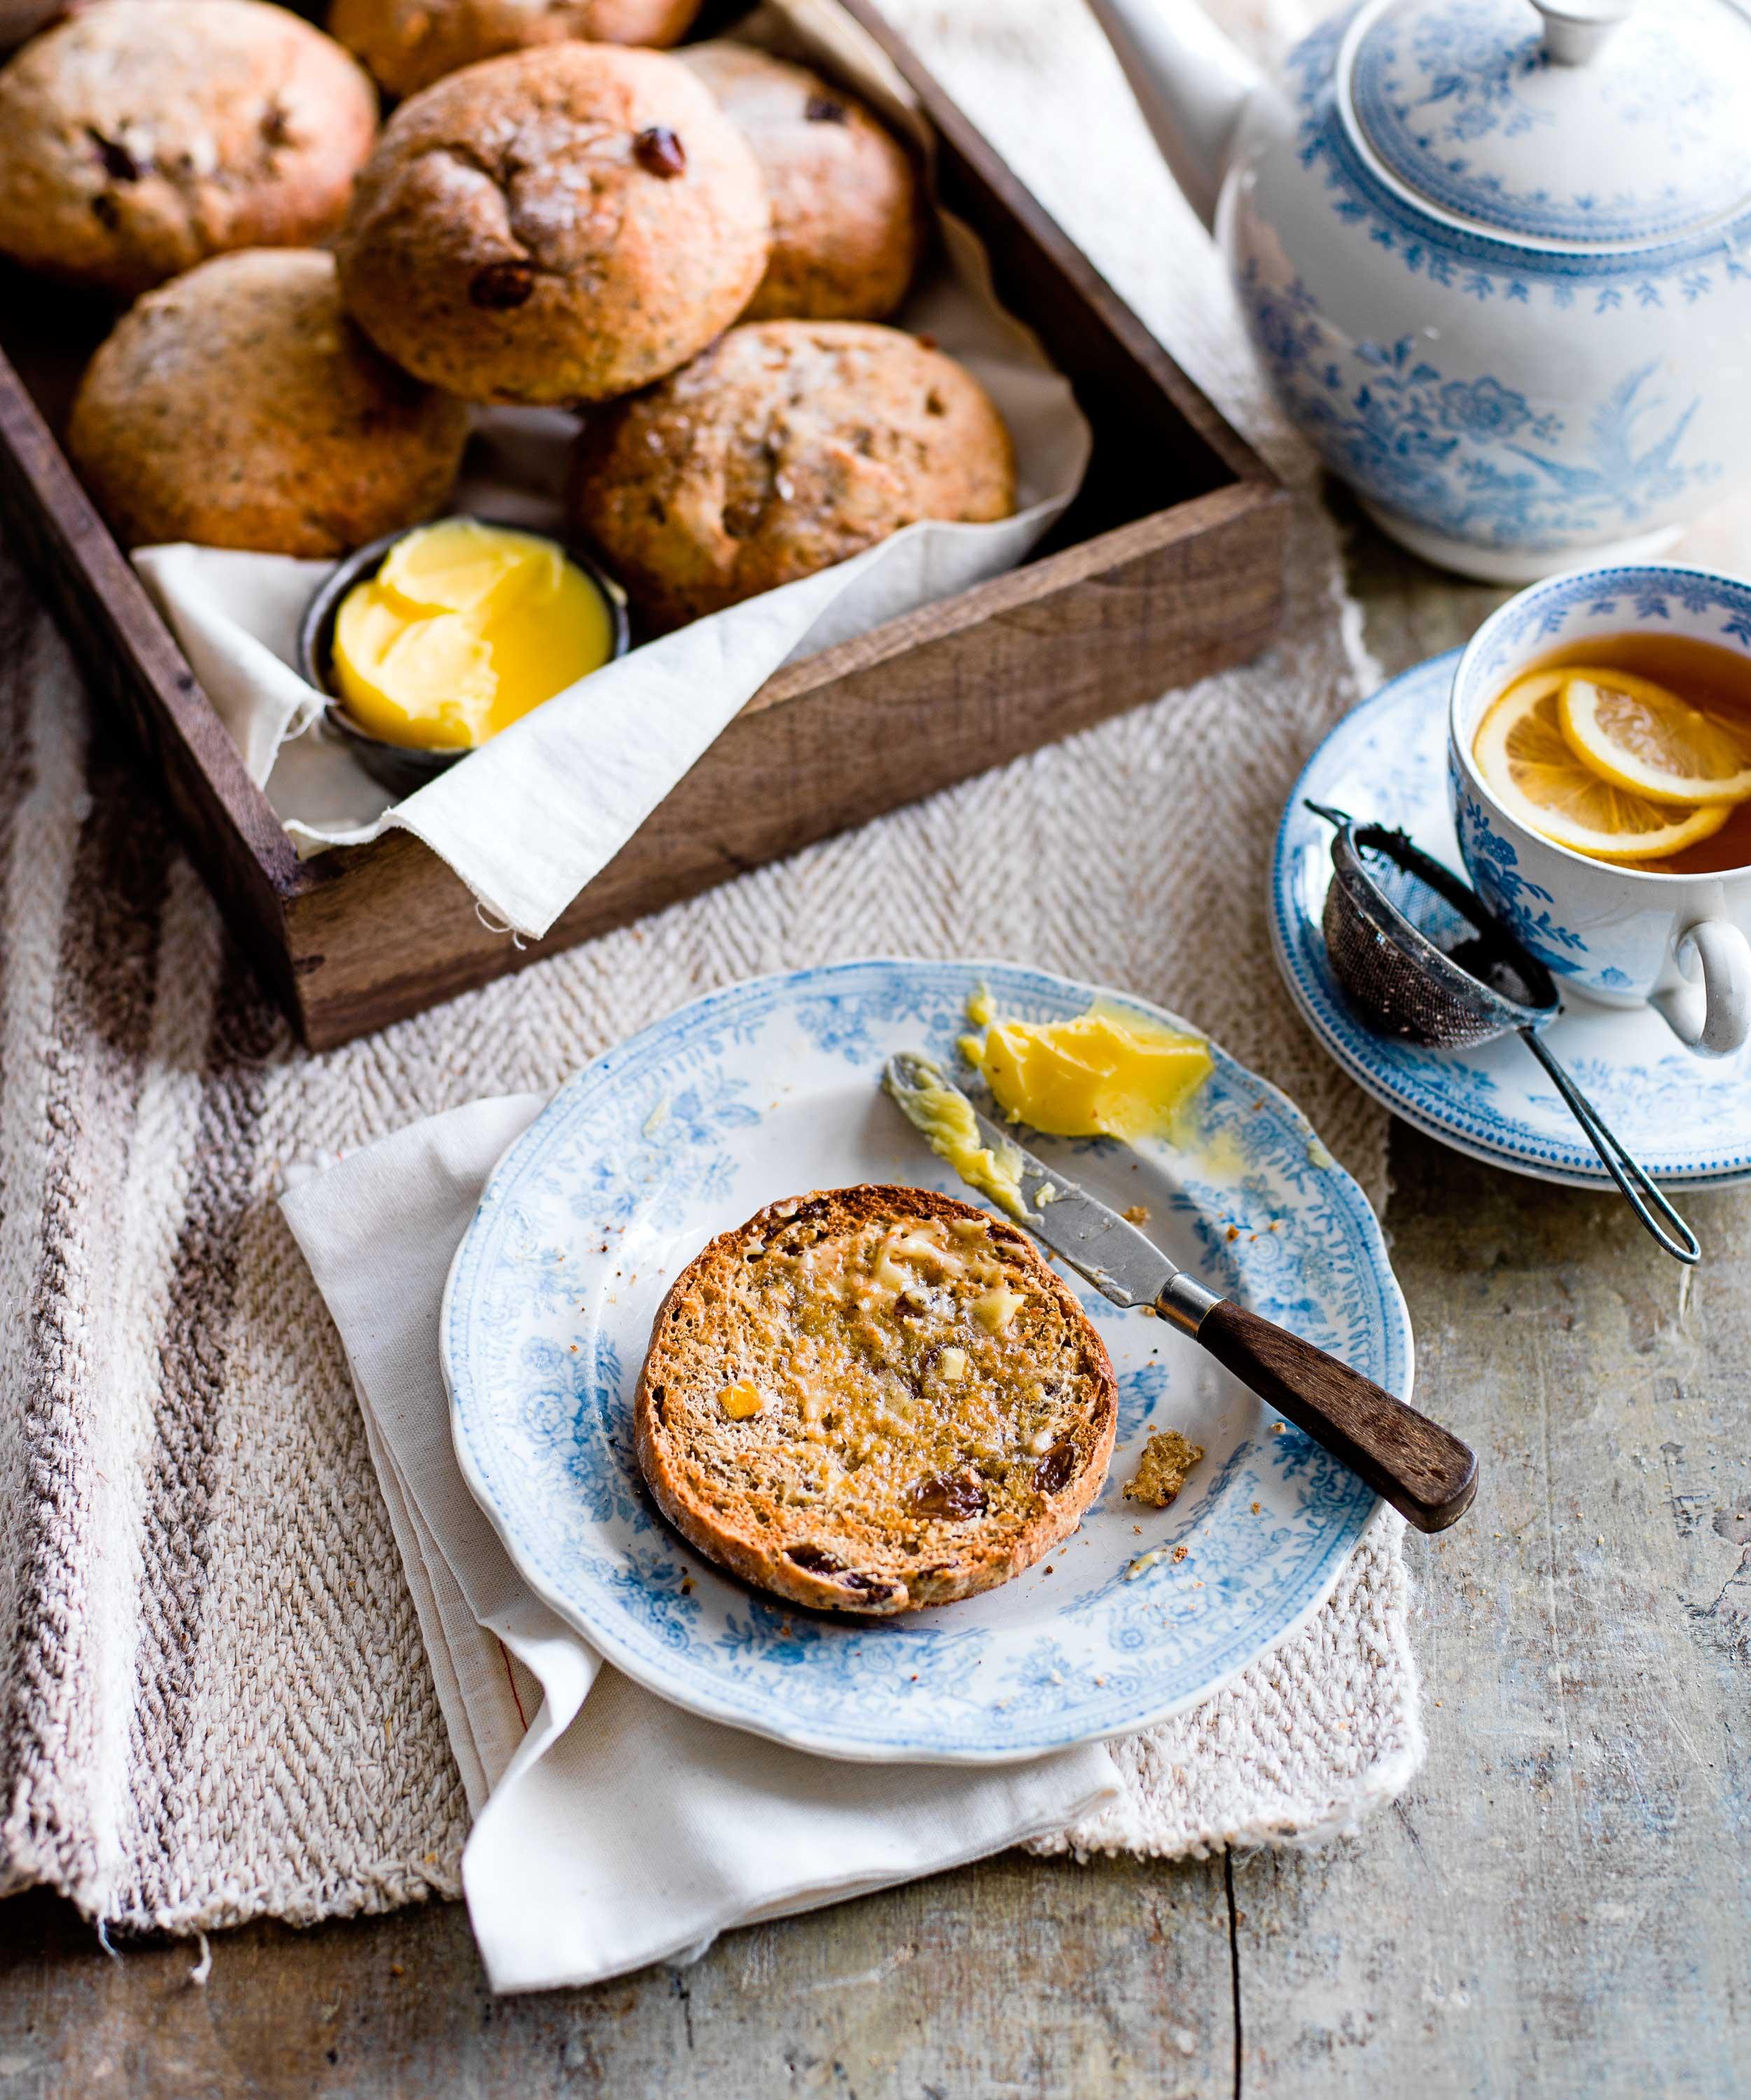 Earl grey teacakes © Ant Duncan